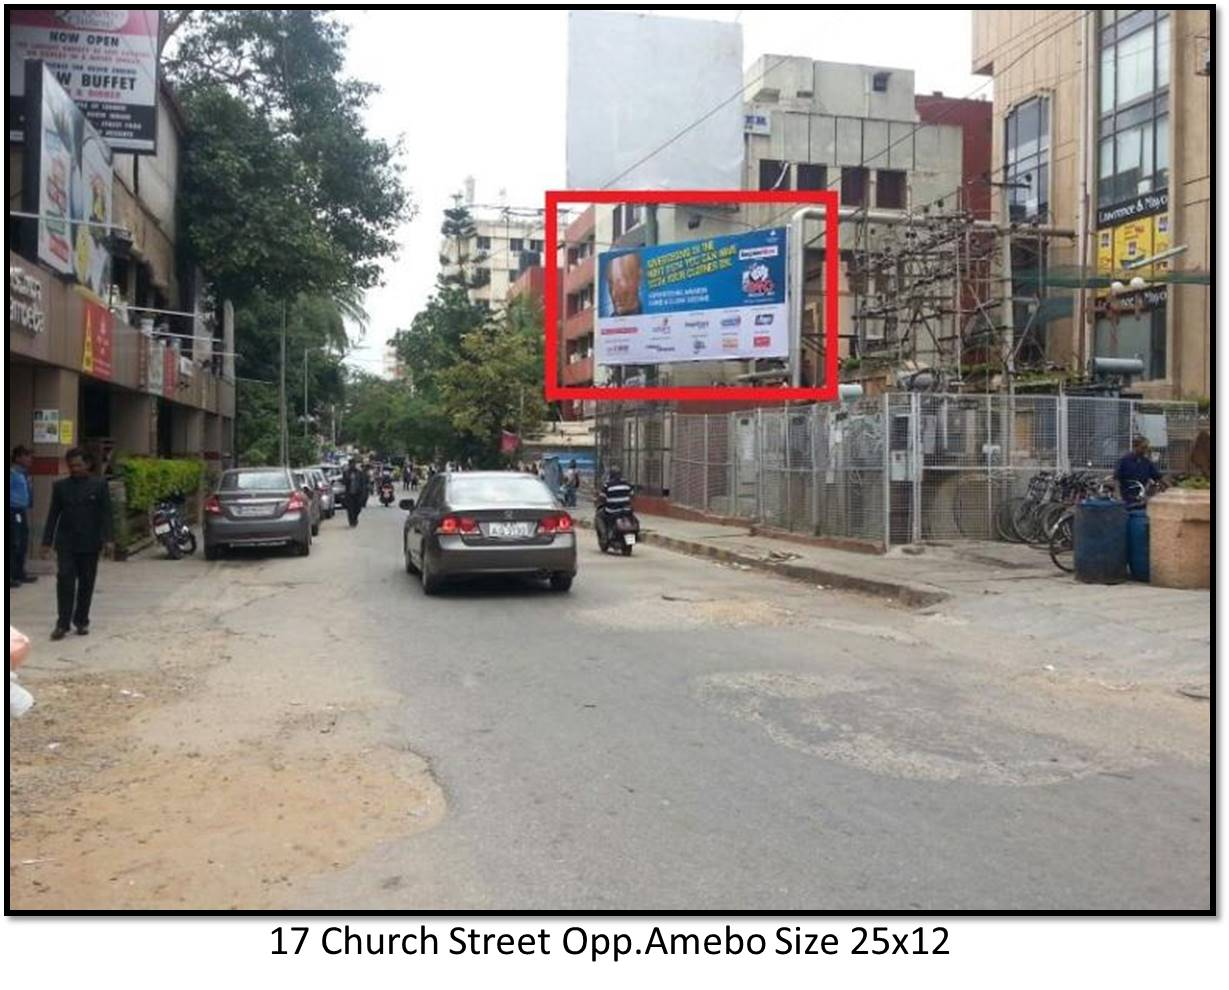 Church Street Opp.Amebo Size, Bengaluru